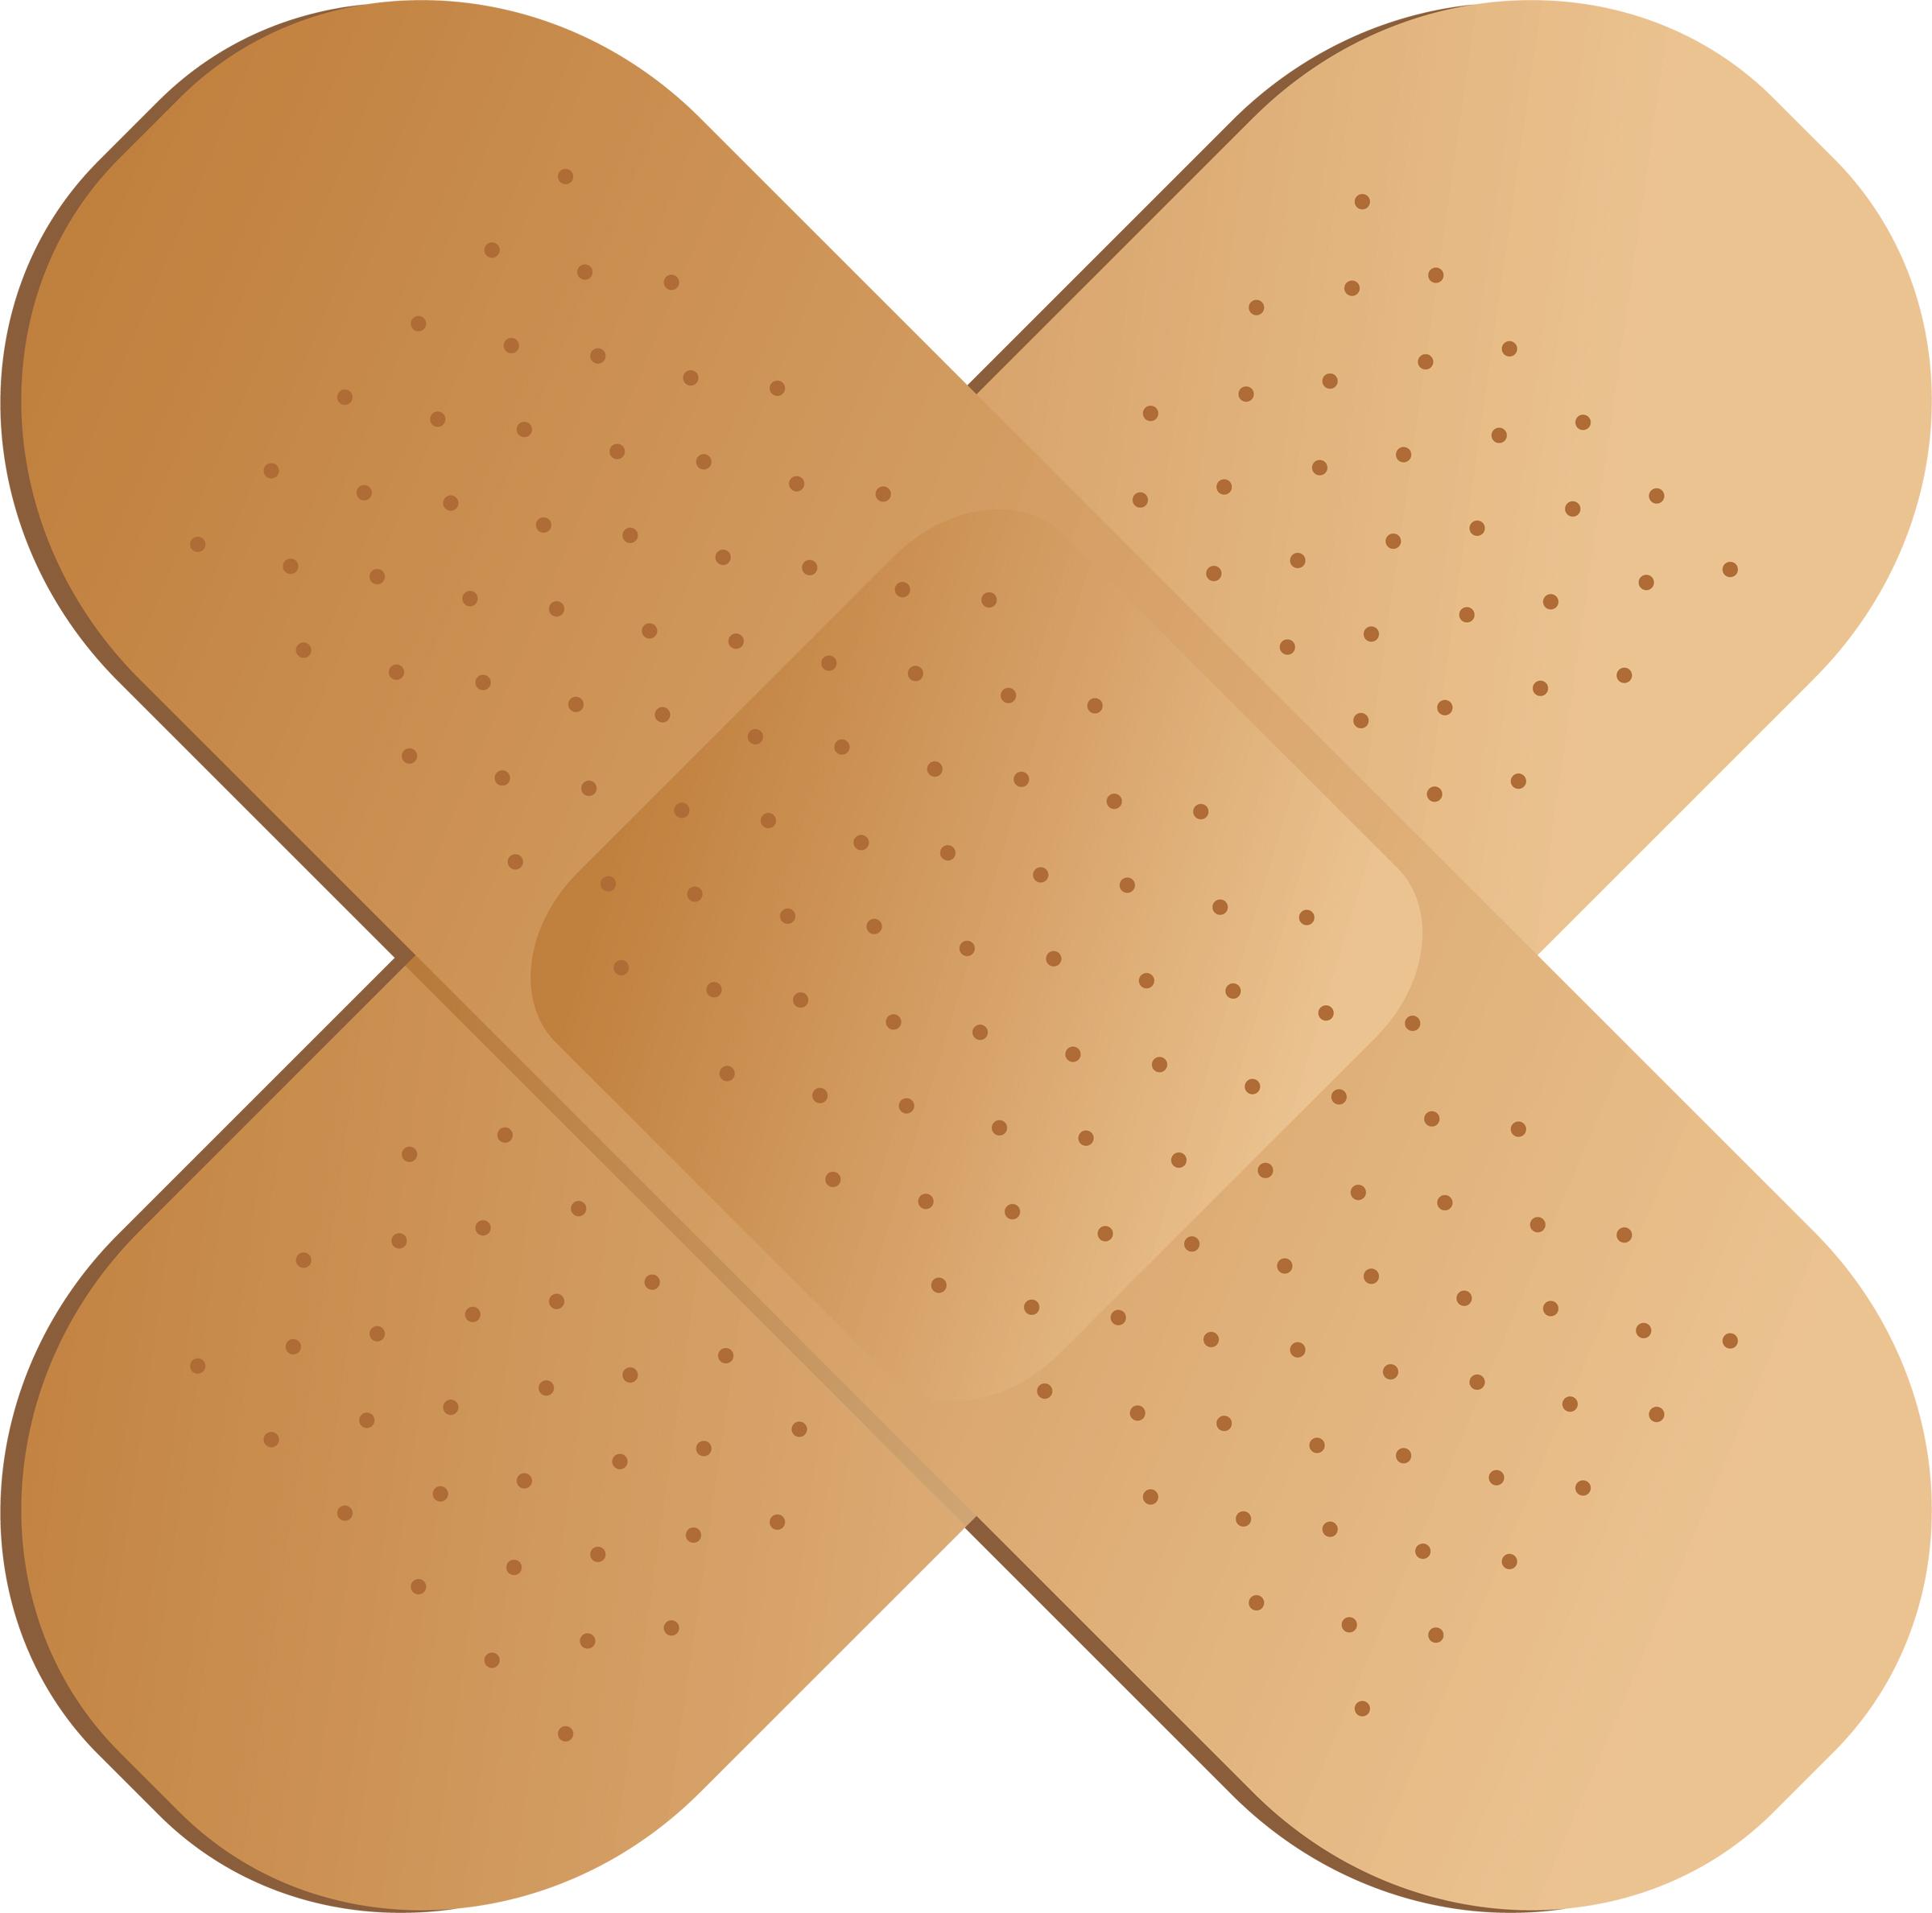 Image of bandaid clipart 9 clip art band aid 2